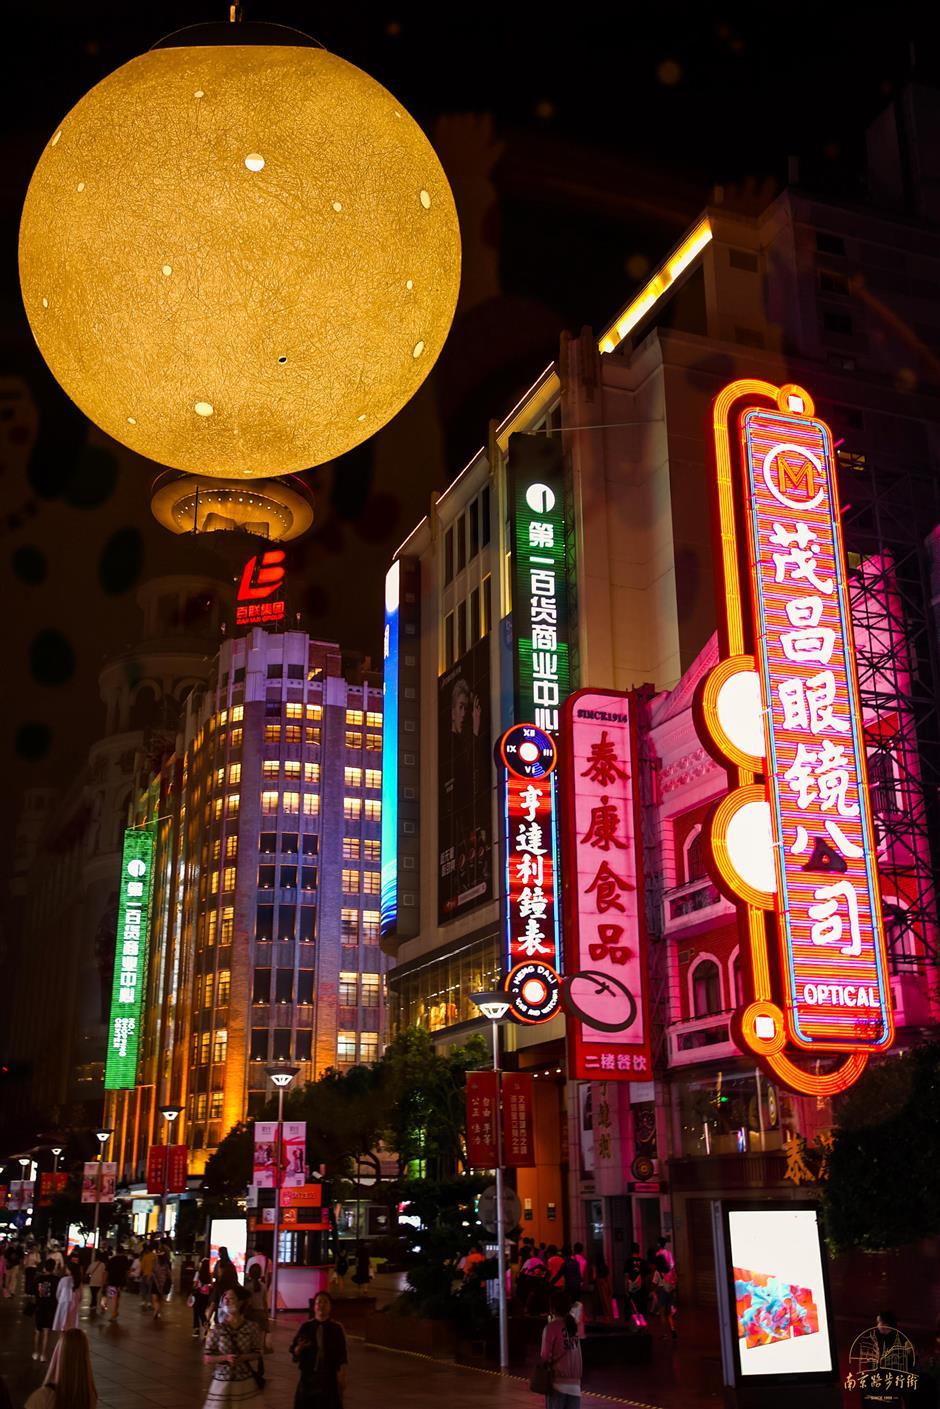 Public art installations enliven Nanjing Road Pedestrian Mall